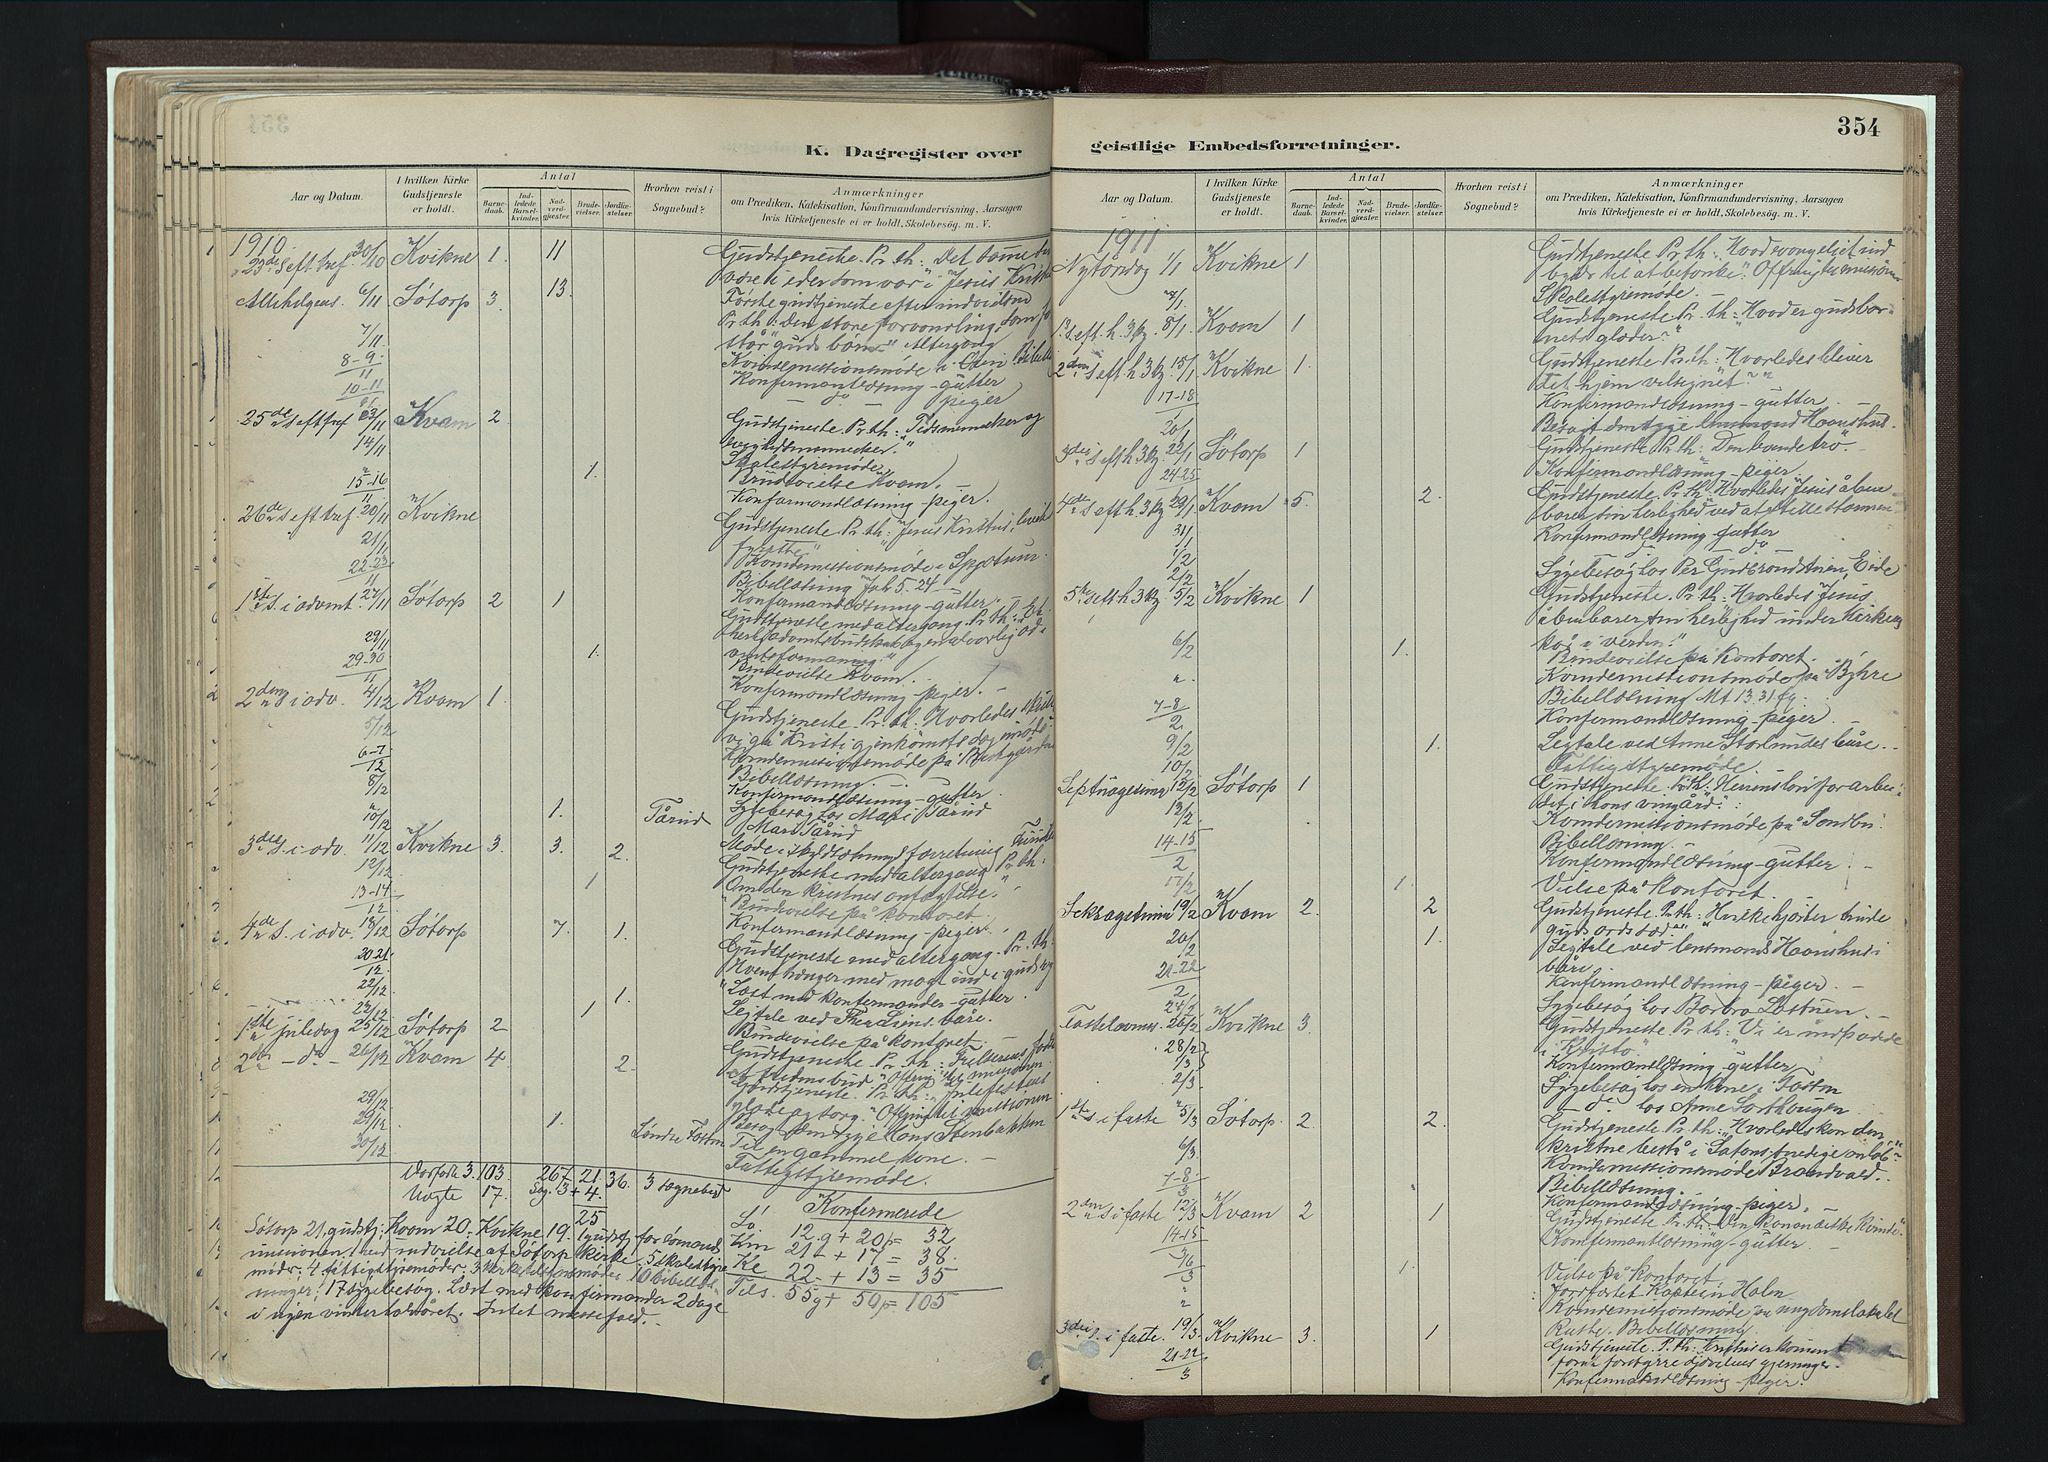 SAH, Nord-Fron prestekontor, Ministerialbok nr. 4, 1884-1914, s. 354